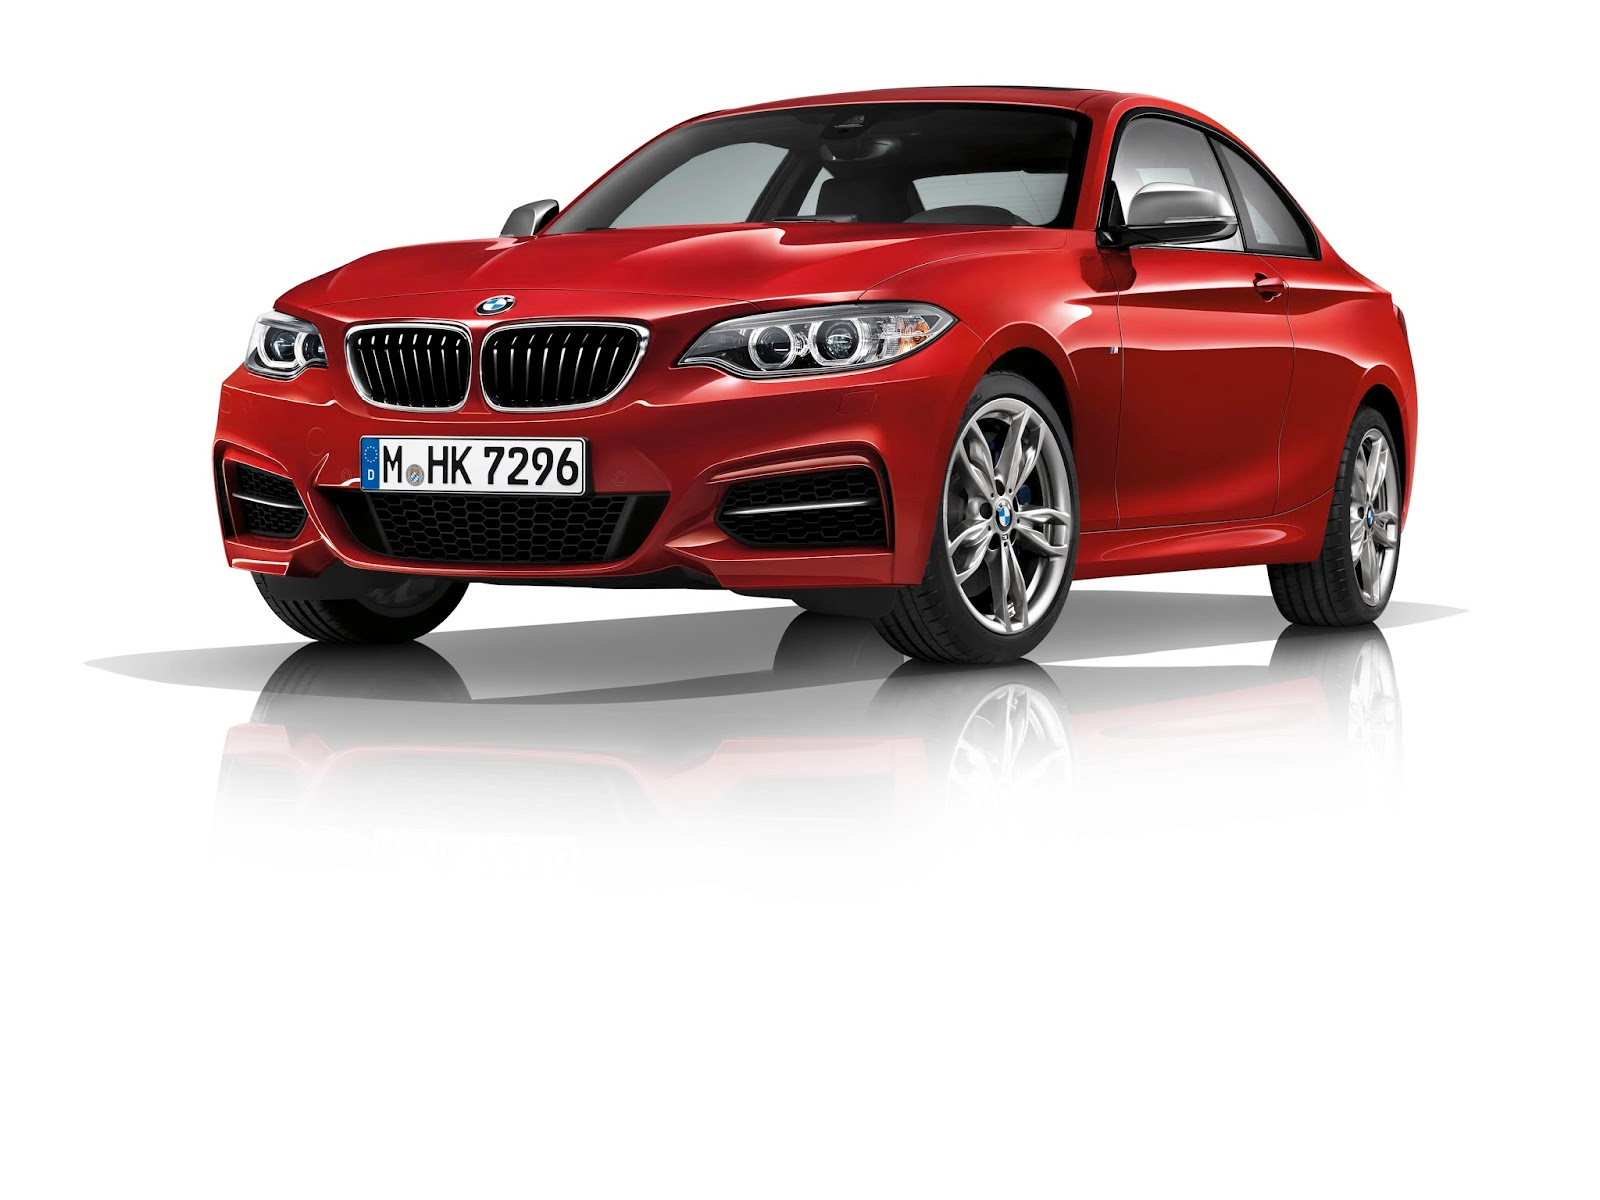 P90219023 highRes bmw m240i coupe 340 άλογα και τετρακίνηση στη Σειρά 1 της BMW! BMW, Bmw 2, BMW M, BMW M Performance, BMW M1, BMW M140i, BMW M2 Coupé, BMW M240i Cabrio, BMW M240i Coupe, Engine, zblog, ΒΜW 1